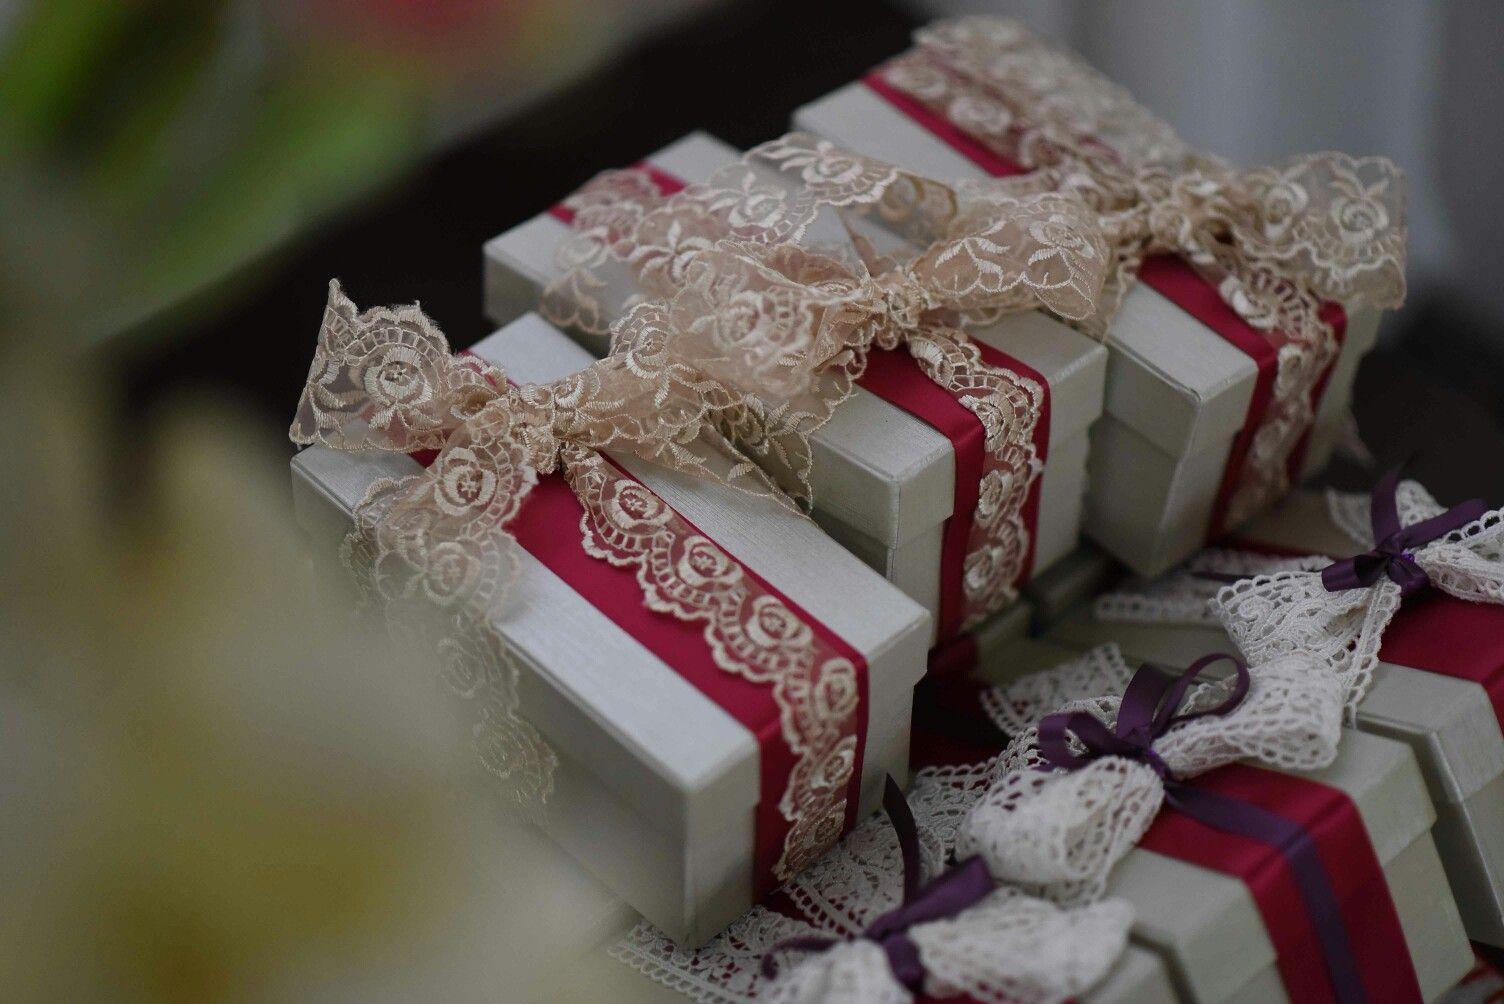 Souvenir Untuk Ibu Ibu Penyiram Yang Berisi Hand Sanitizer Sabun